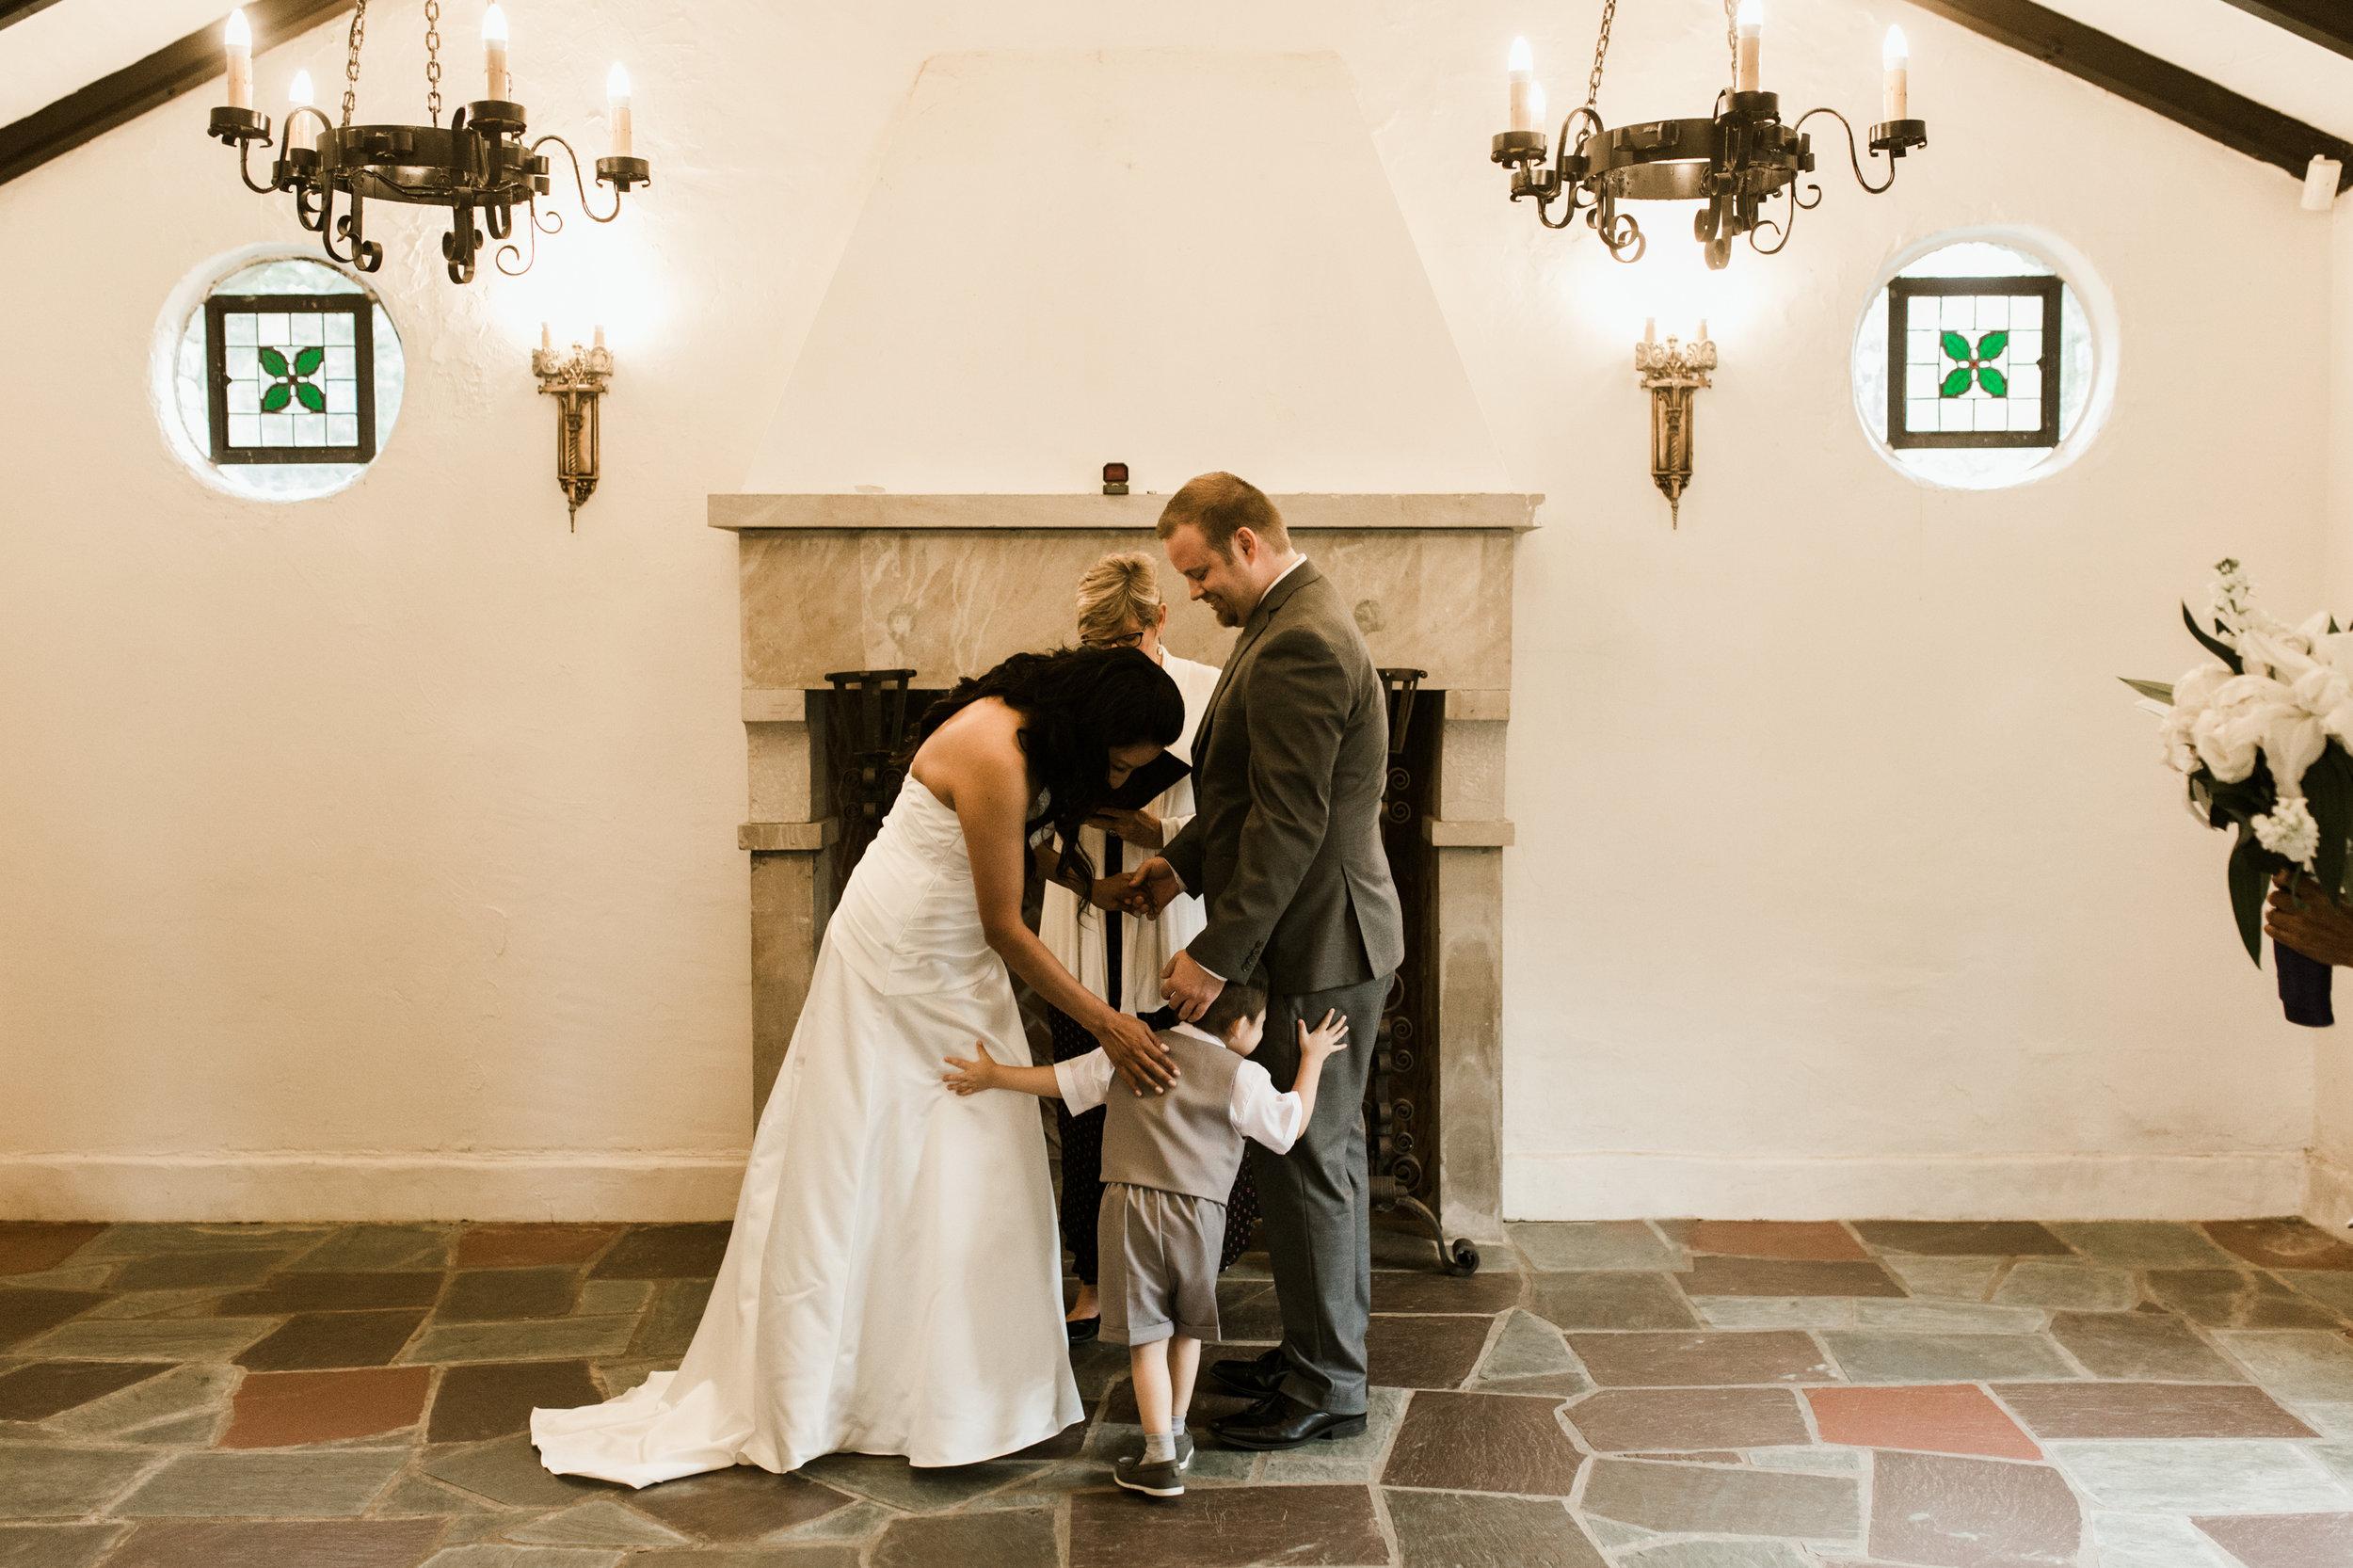 Kentucky Wedding Louisville Wedding Photographer 2018 Crystal Ludwick Photo Louisville Wedding Photographer Kentucky Wedding Photographer (35 of 76).jpg